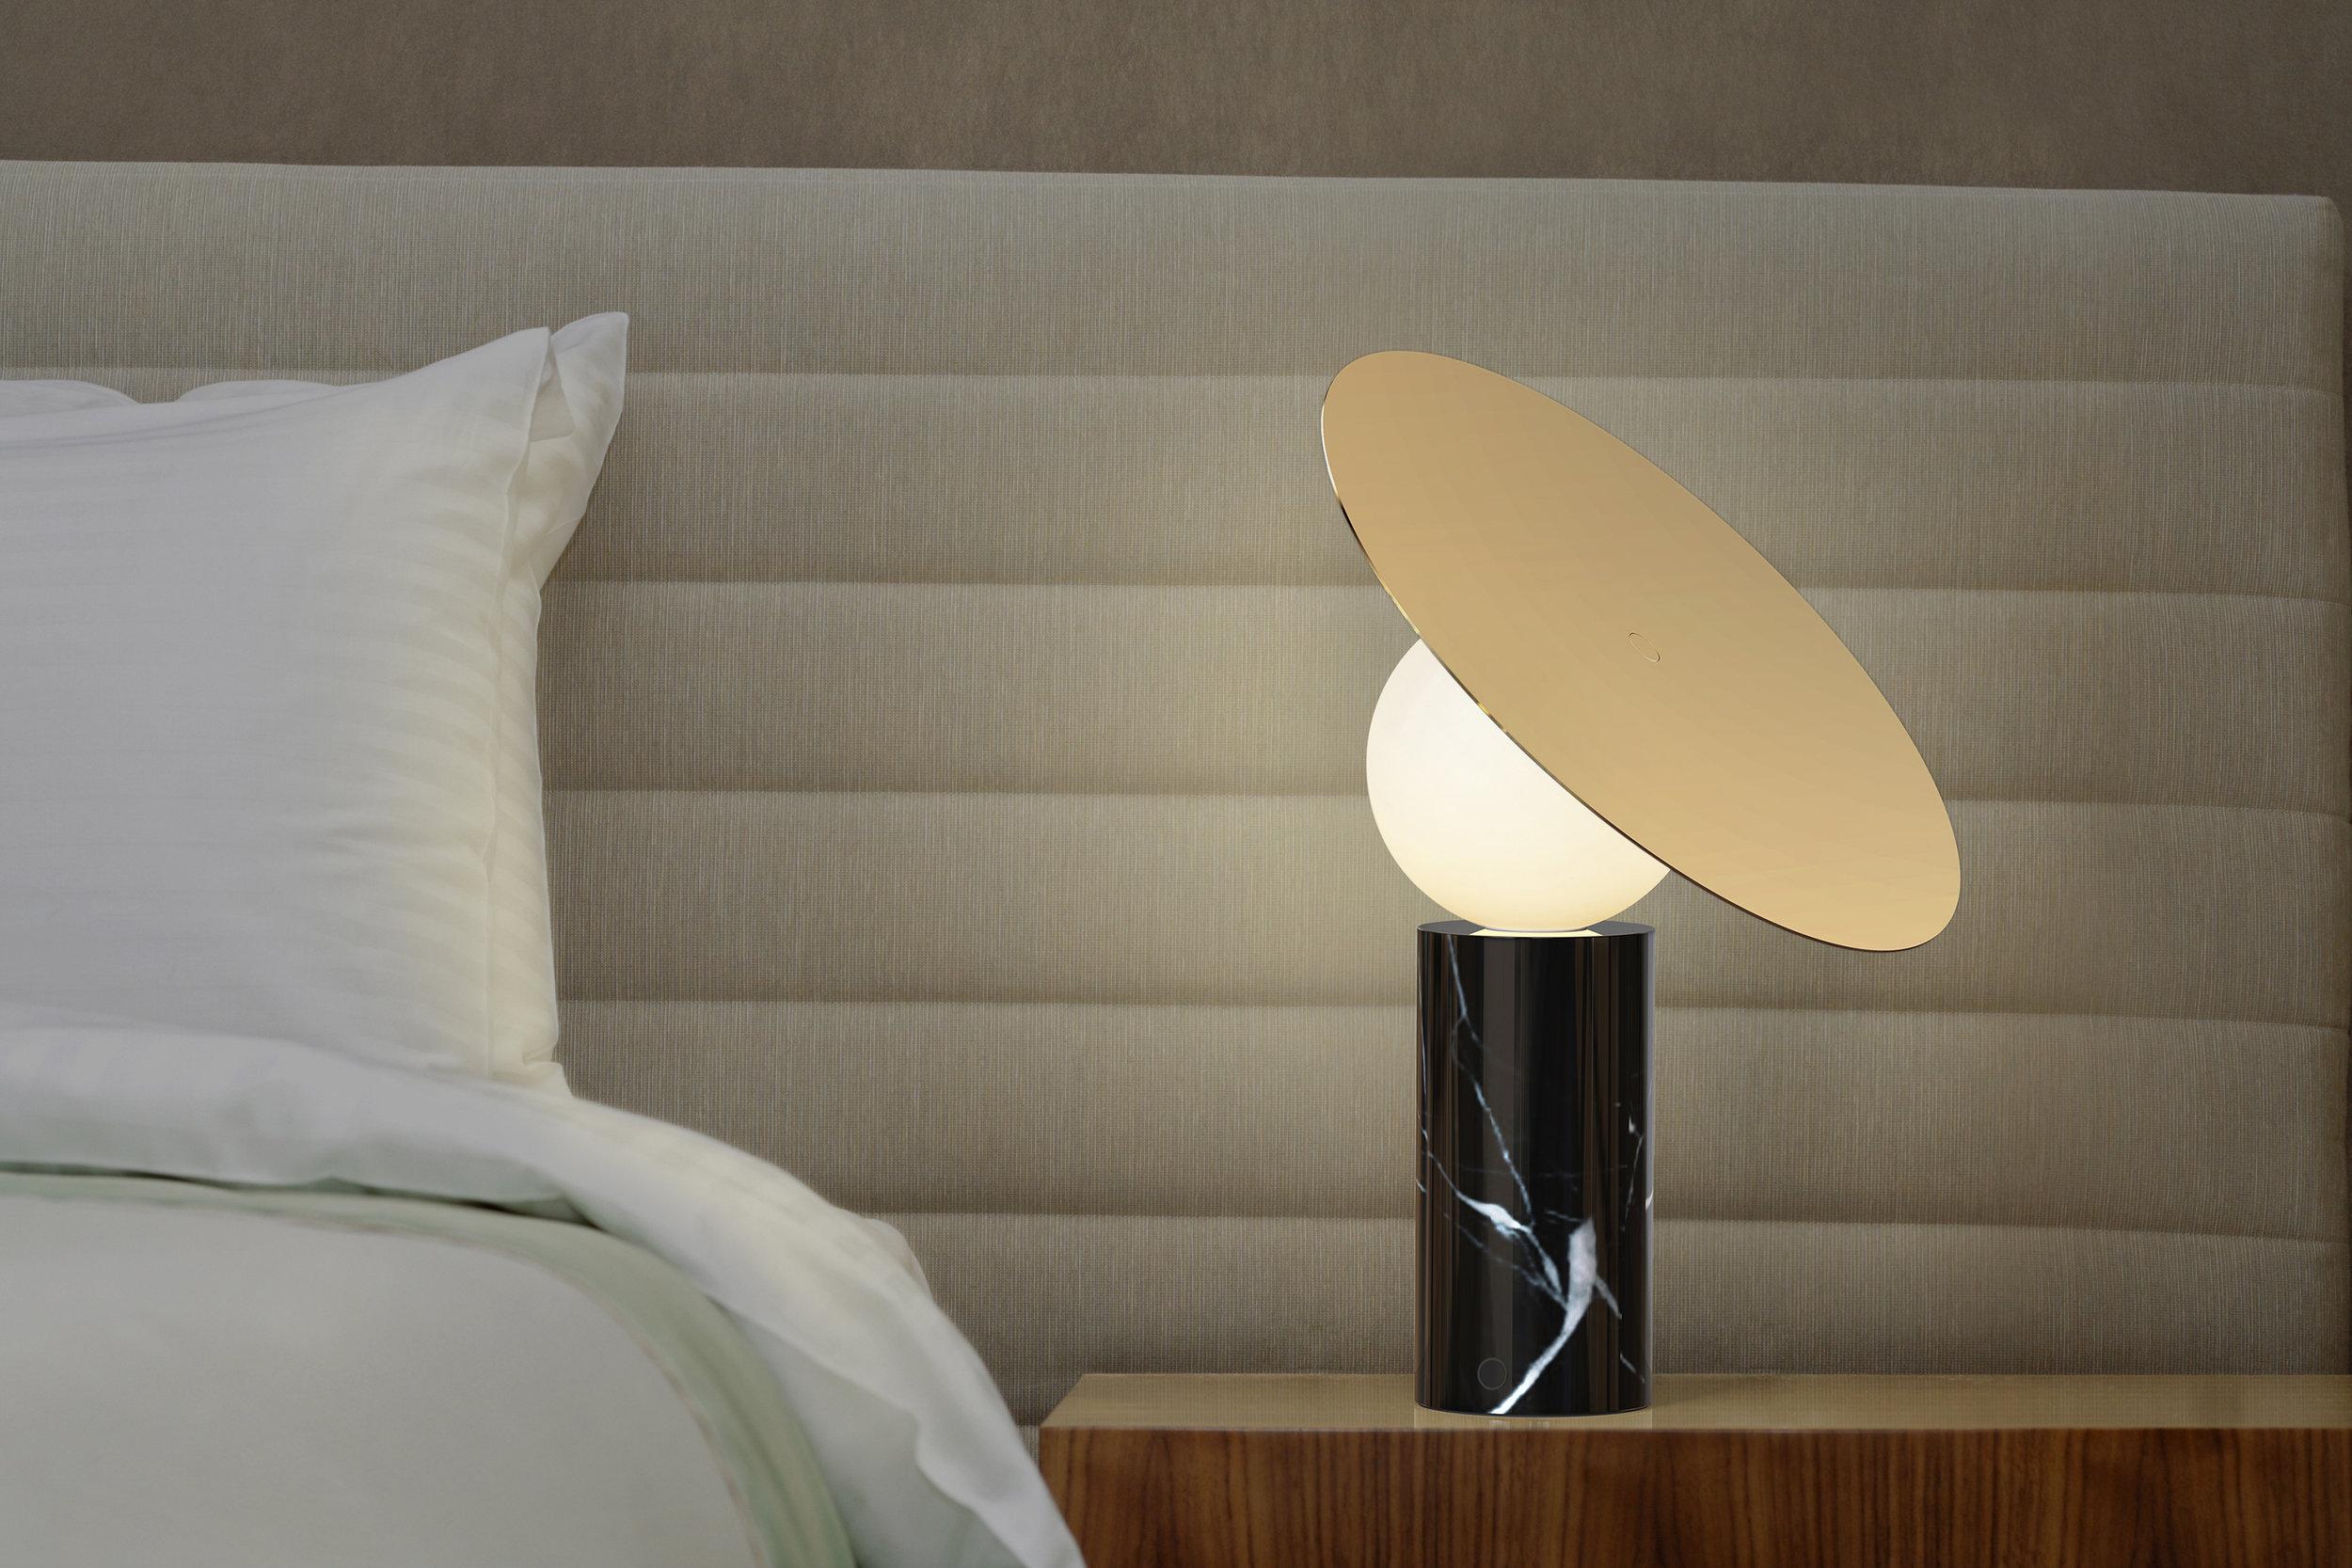 Bola Table Bedside-darker shade2 pushbutton.jpg